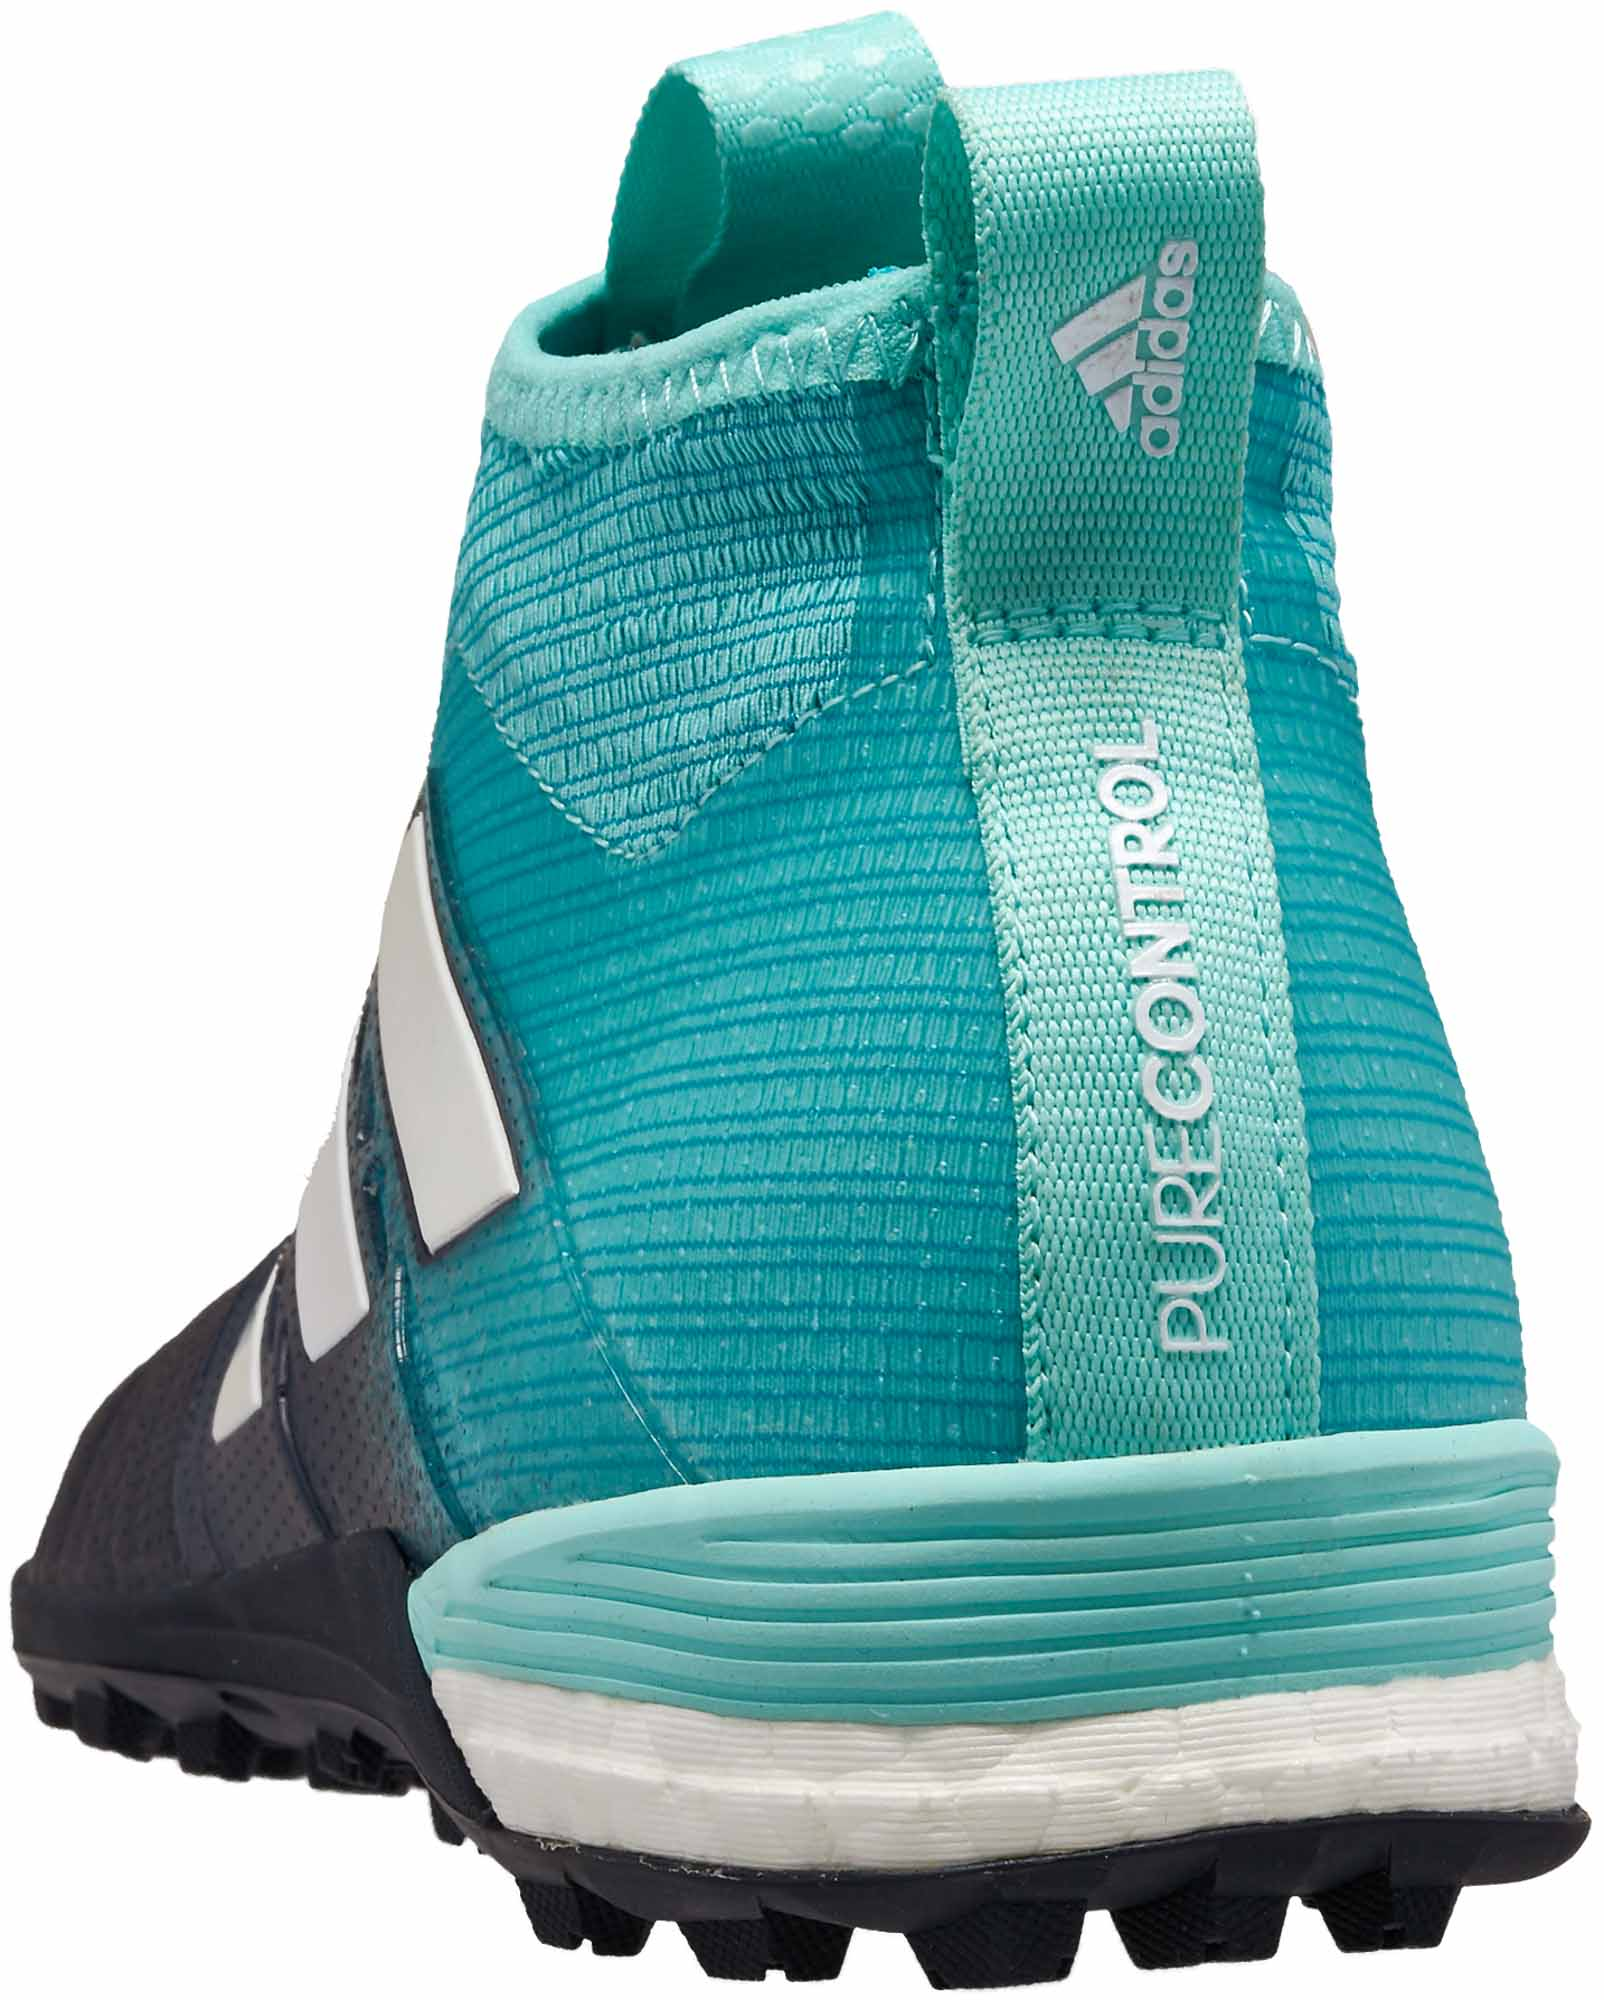 top fashion 9031e 15a61 adidas ACE Tango 17 Purecontrol TF – Energy AquaWhite